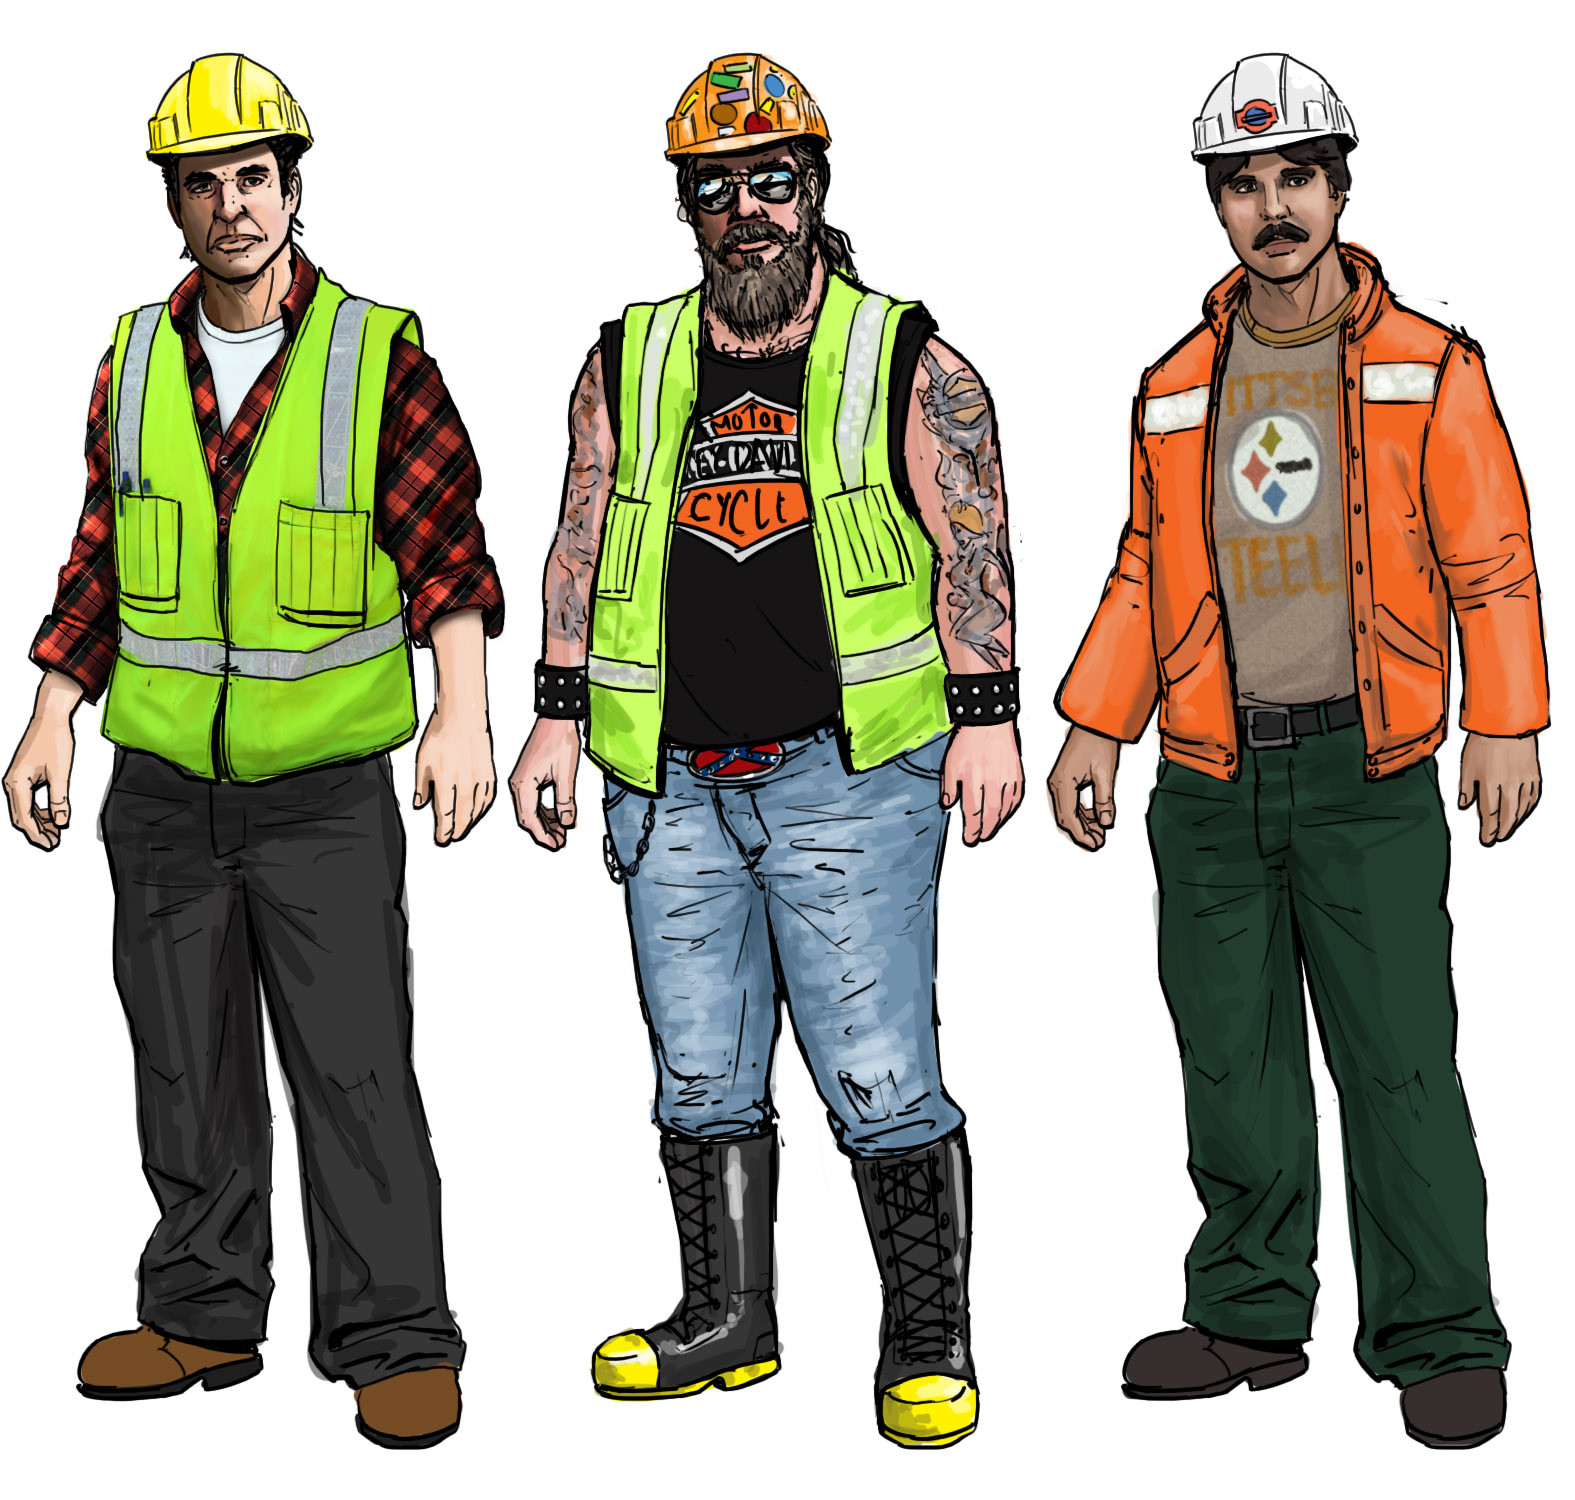 Jeff zugale sop bg dockworker decorators 1